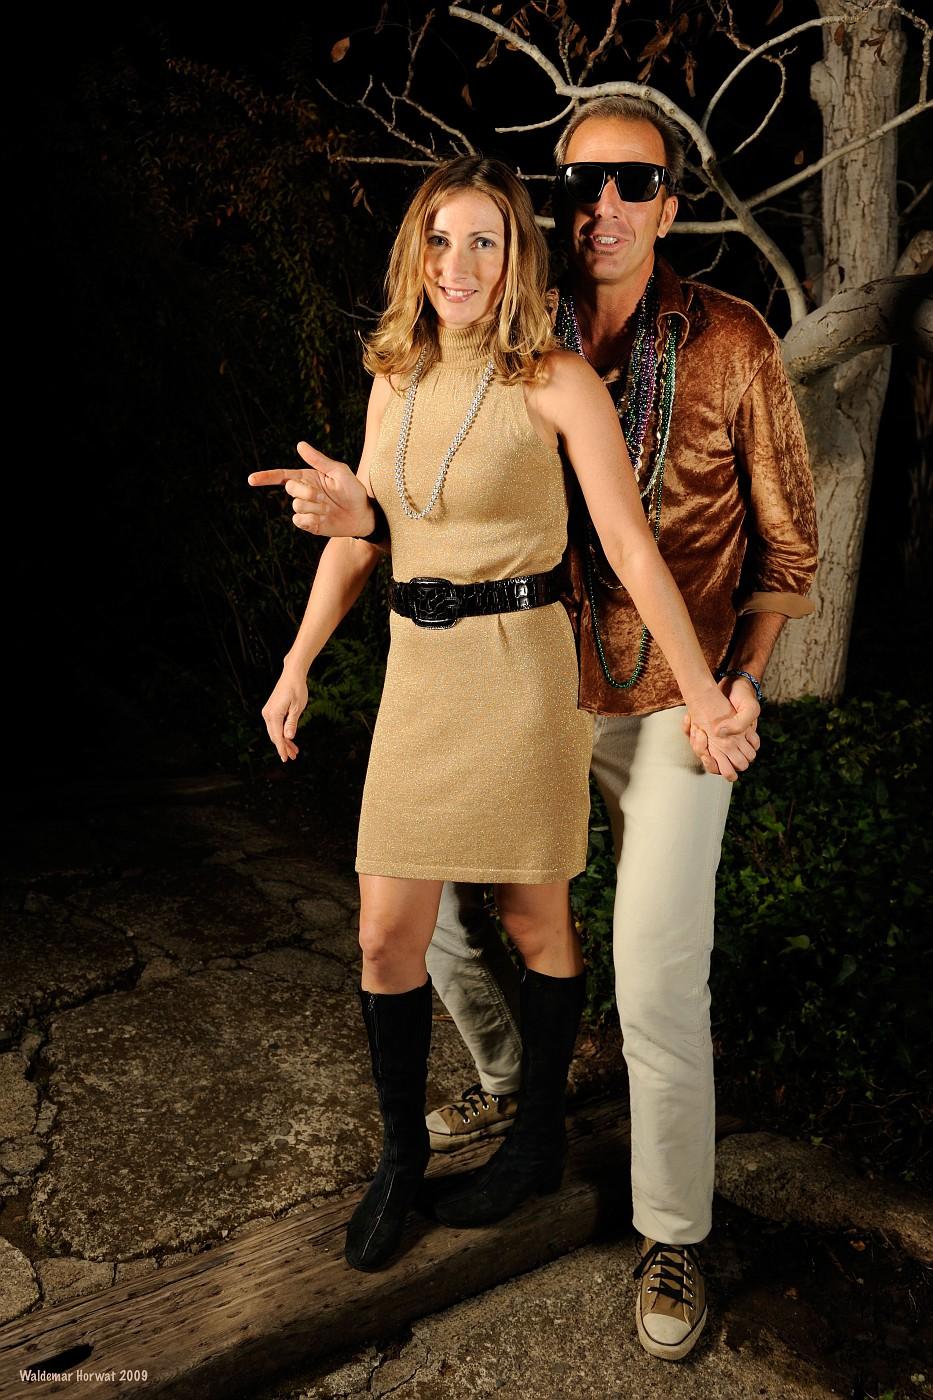 Amy and Jasper